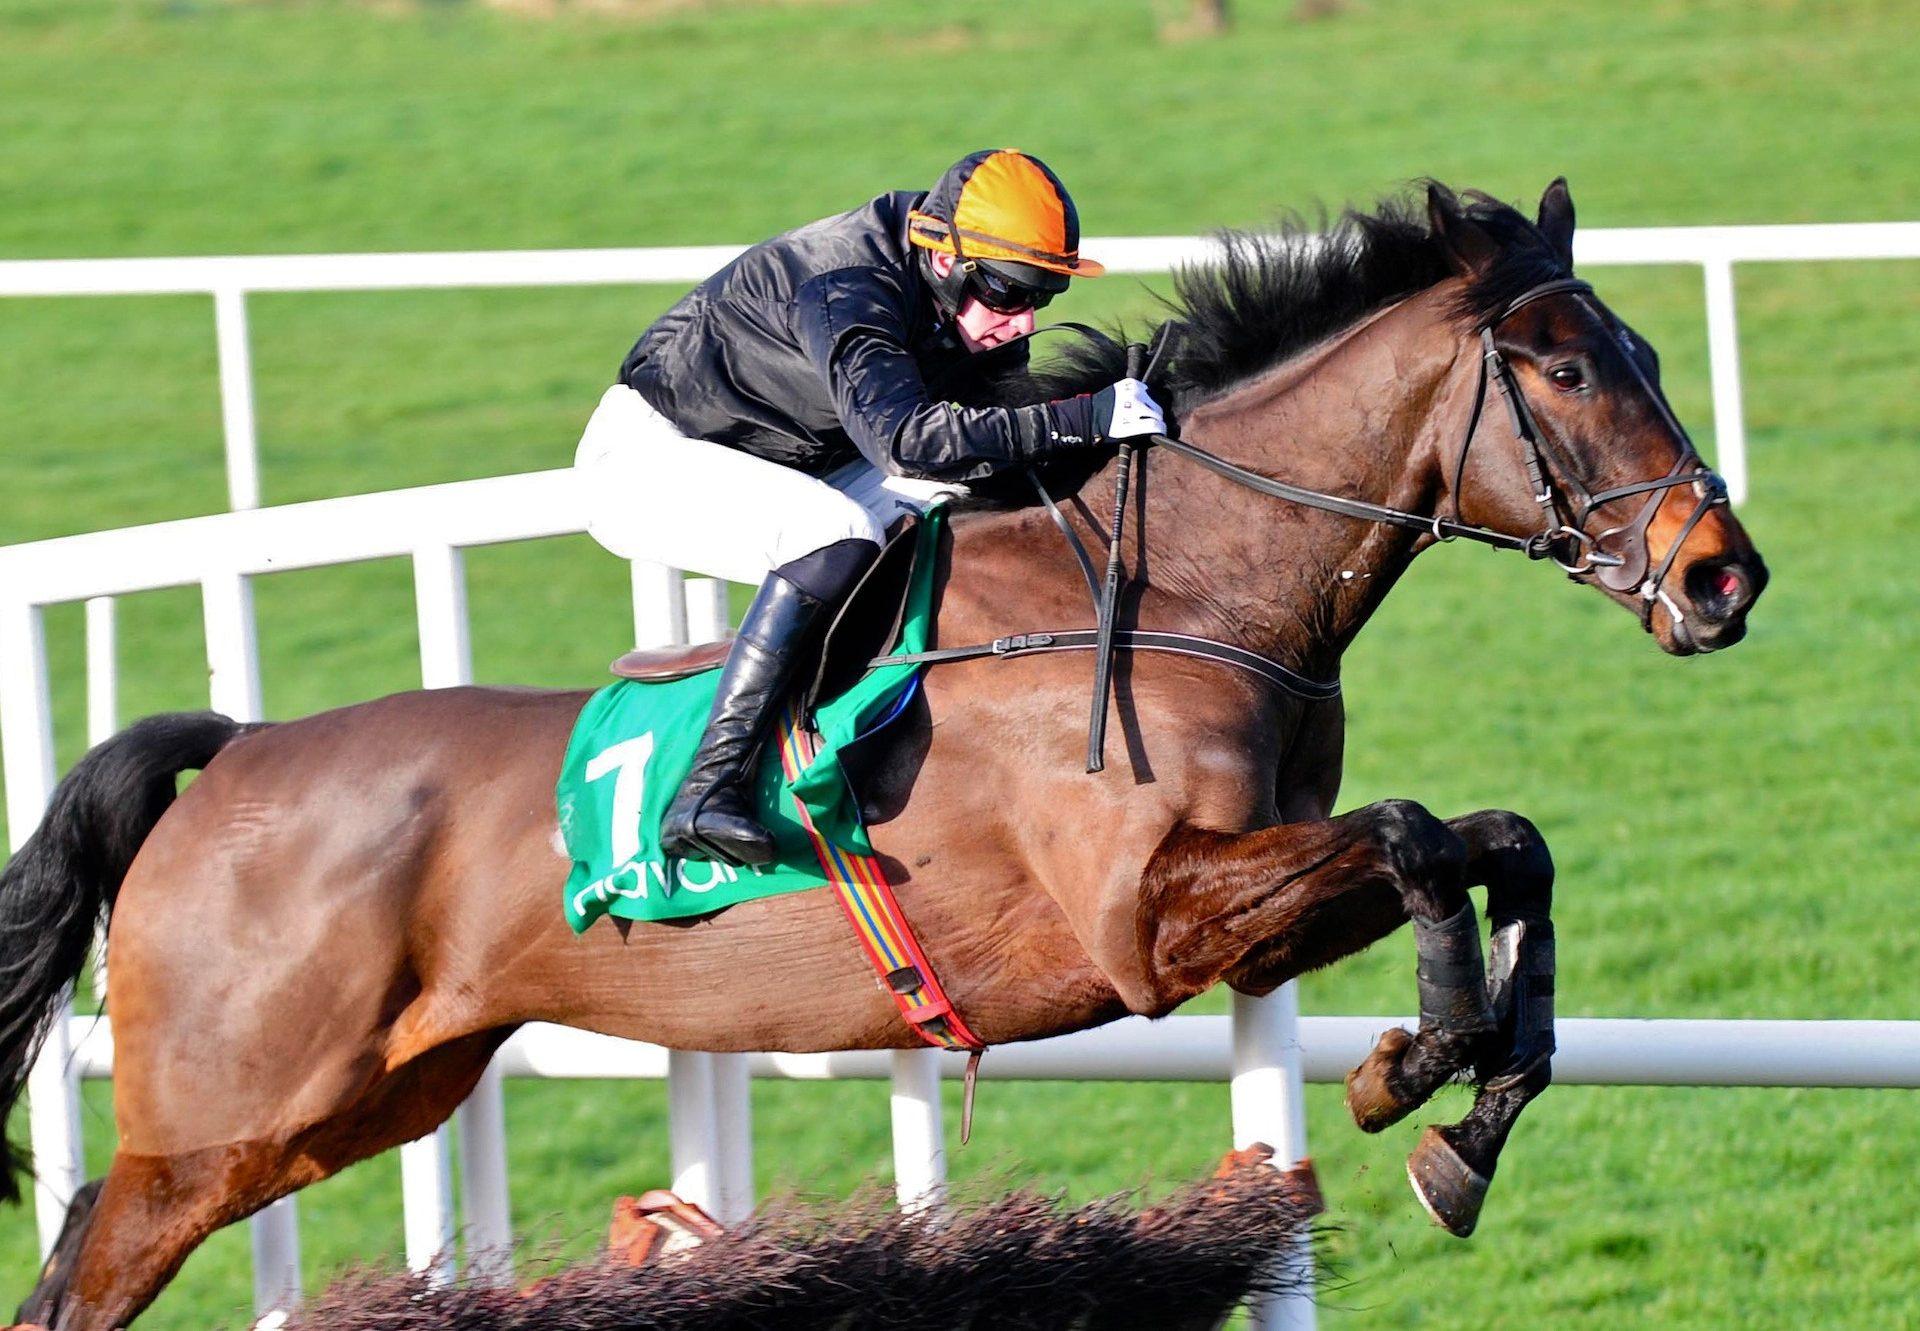 Mr Hendricks (Milan) Wins The Maiden Hurdle At Navan